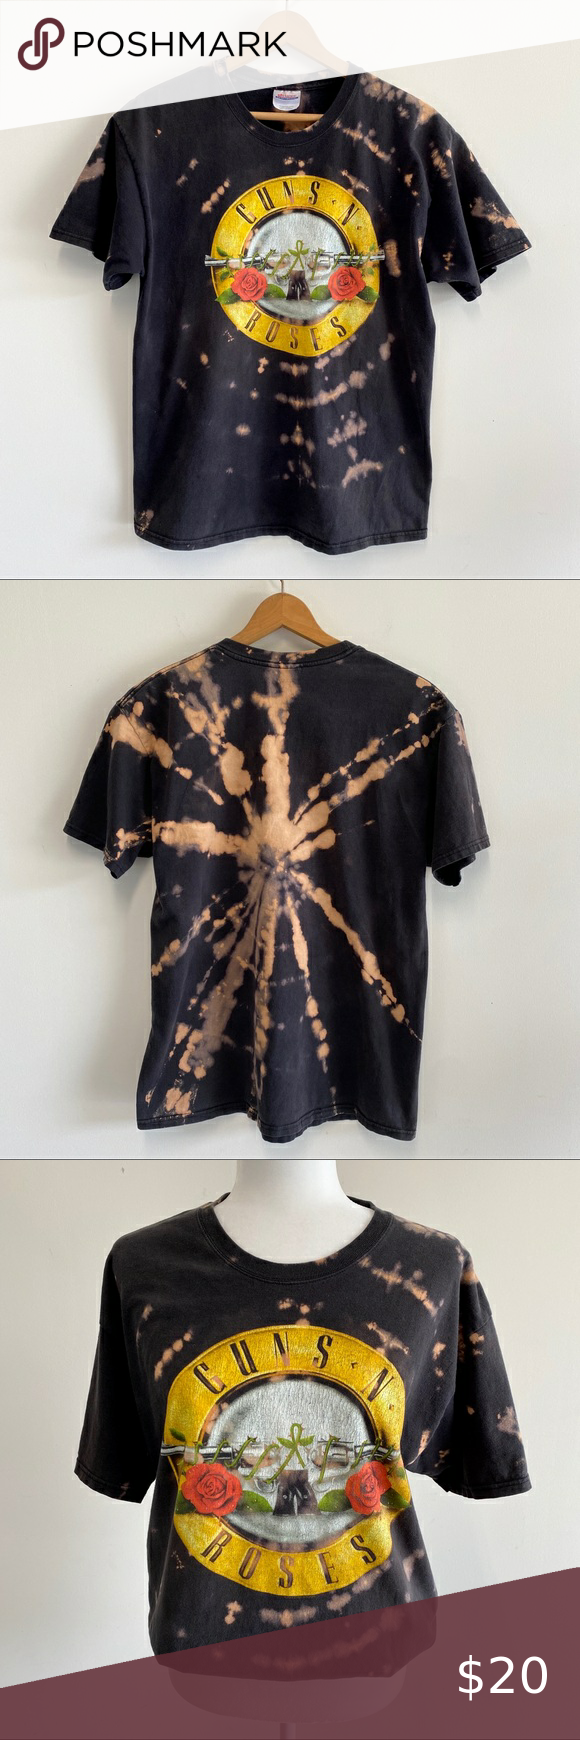 Reverse Tie-Dyed Guns N Roses Graphic Tshirt